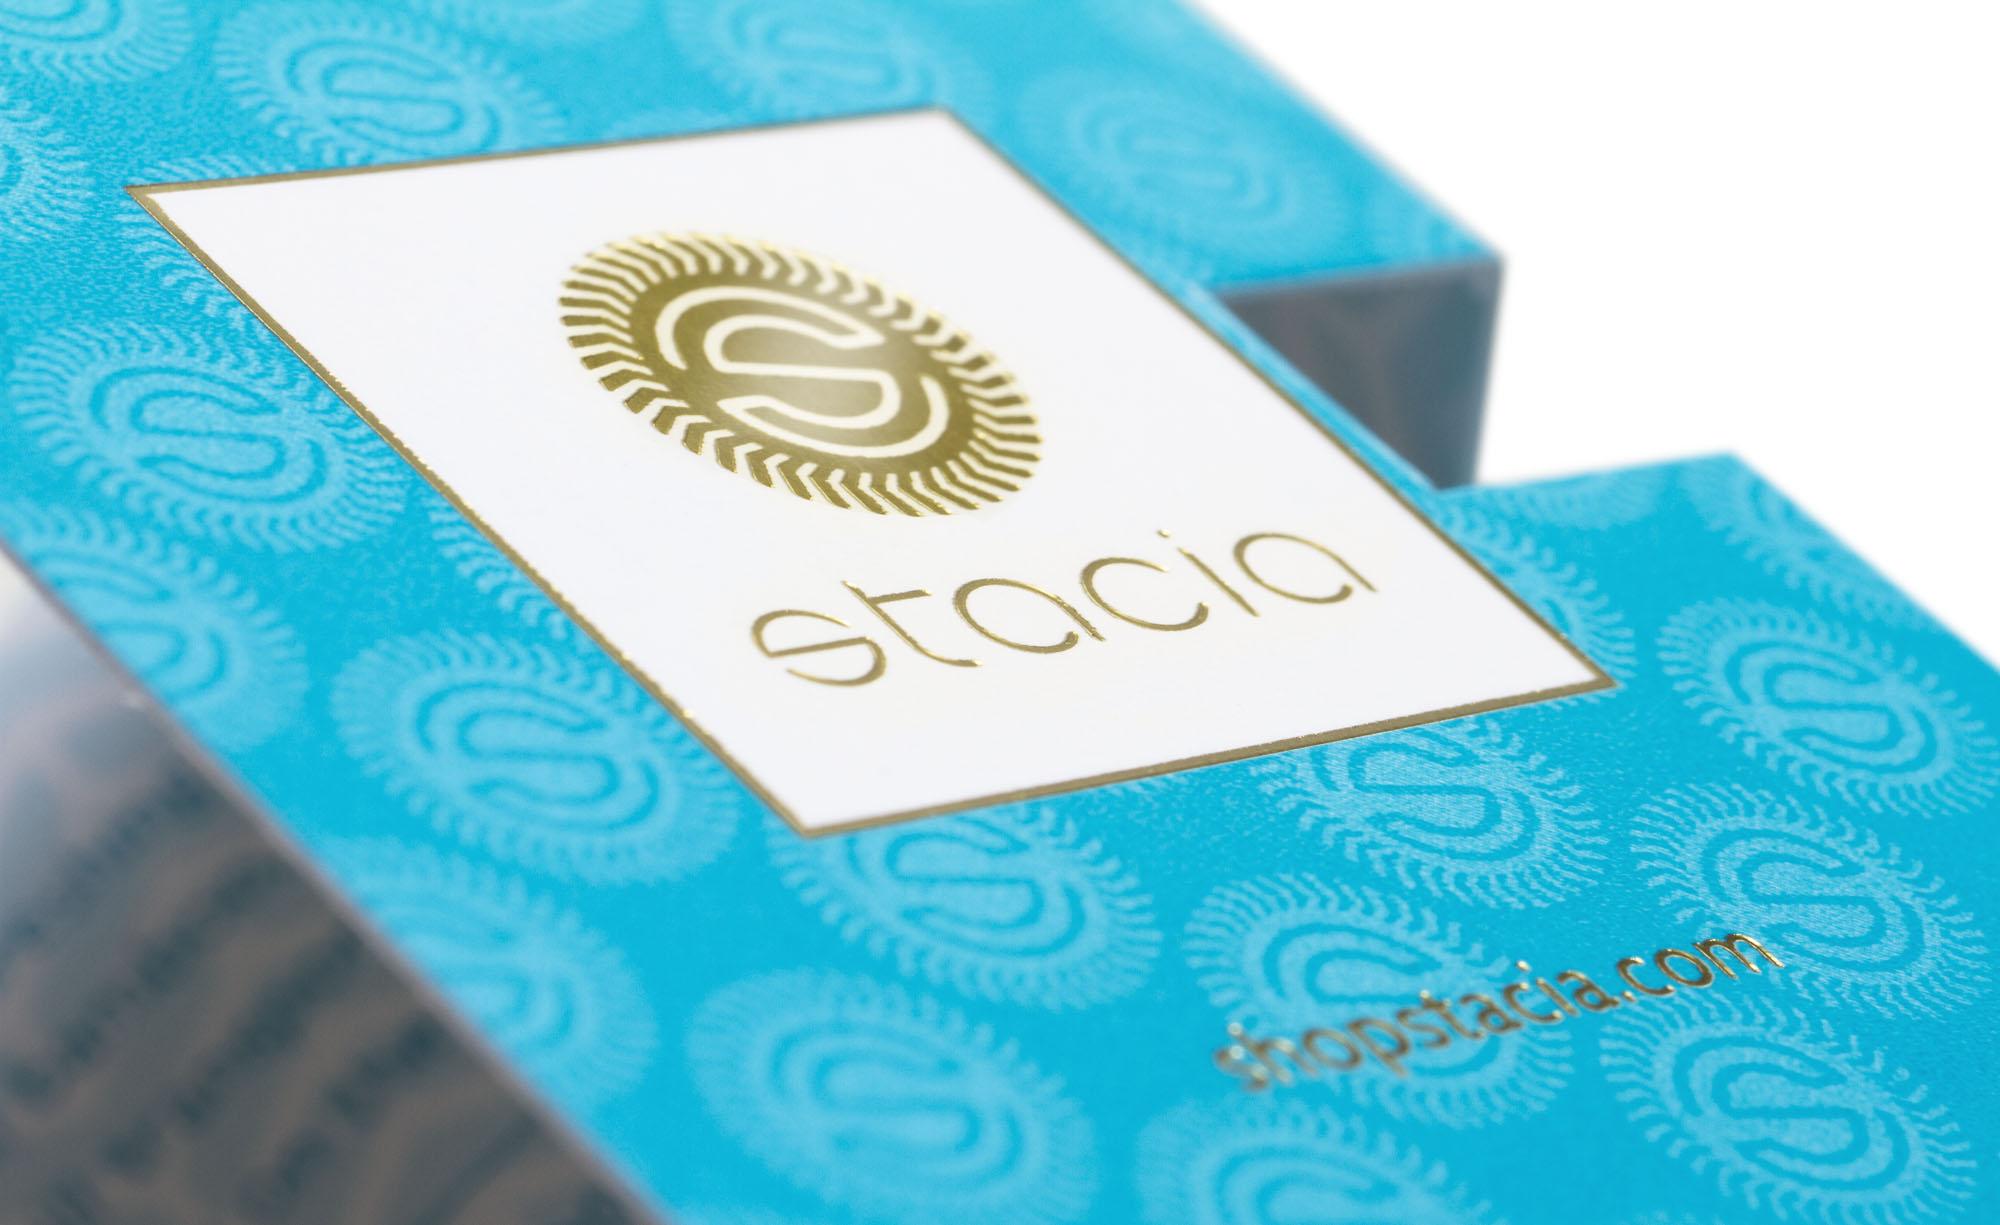 STACIA Booklet Close.jpg